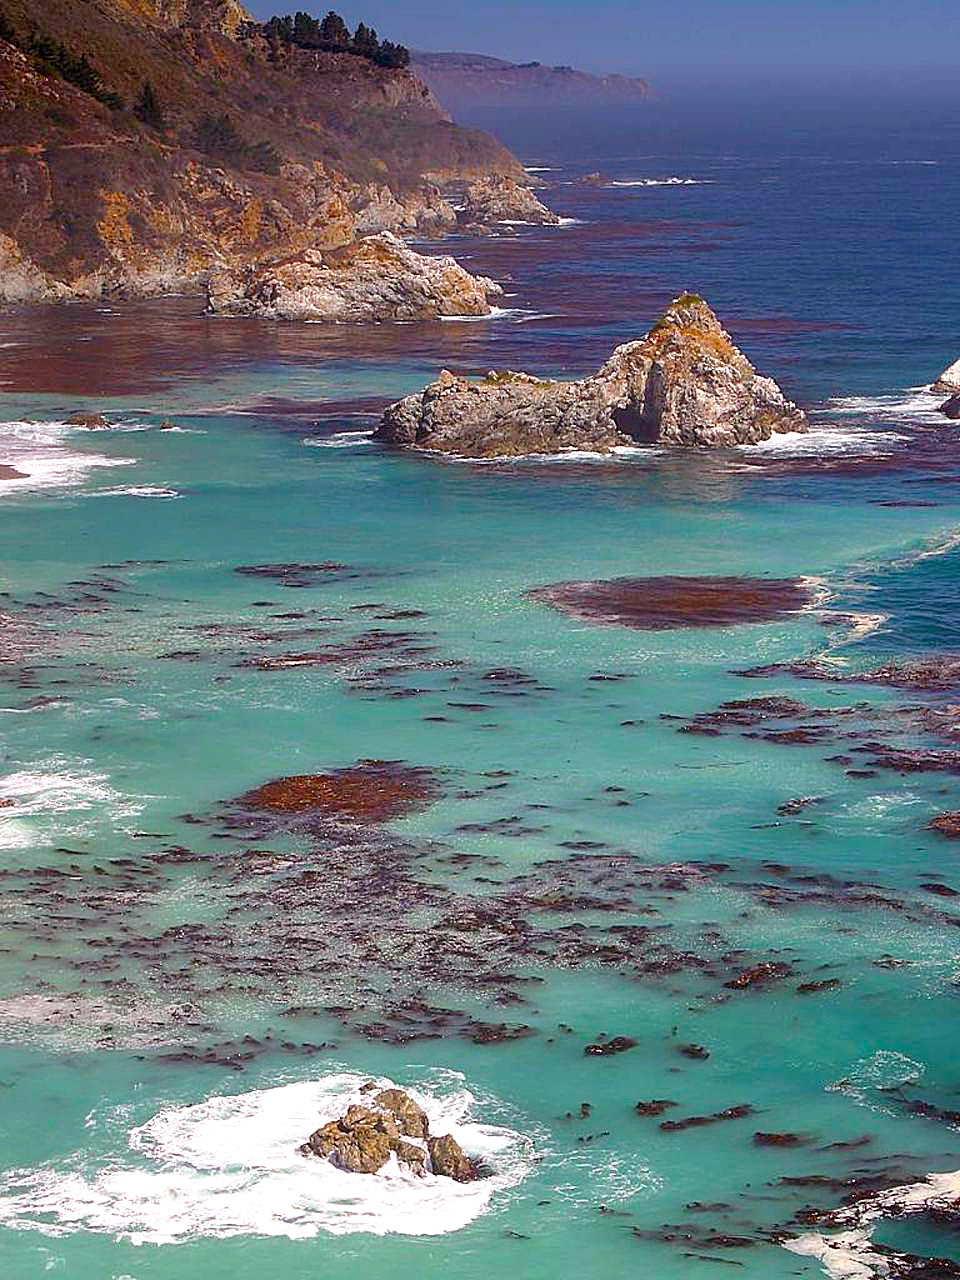 big-sur-rocky-coast-fog-and-giant-kelp-california-alliance-fisheries.jpg